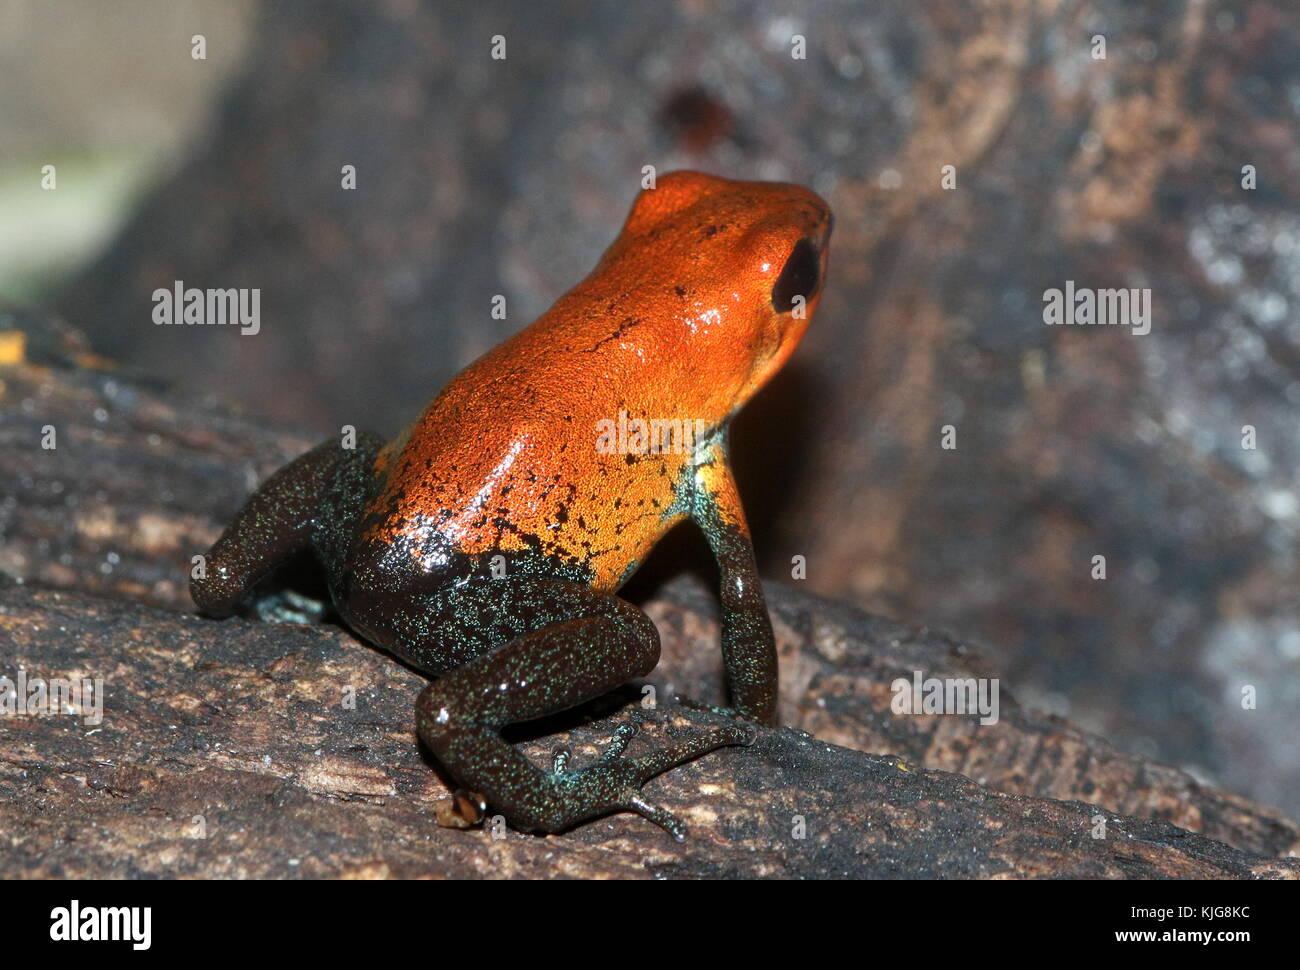 Central American Strawberry poison (dart) frog (Oophaga pumilio, Dendrobates pumilio) - Subspecies Almirante, red - Stock Image